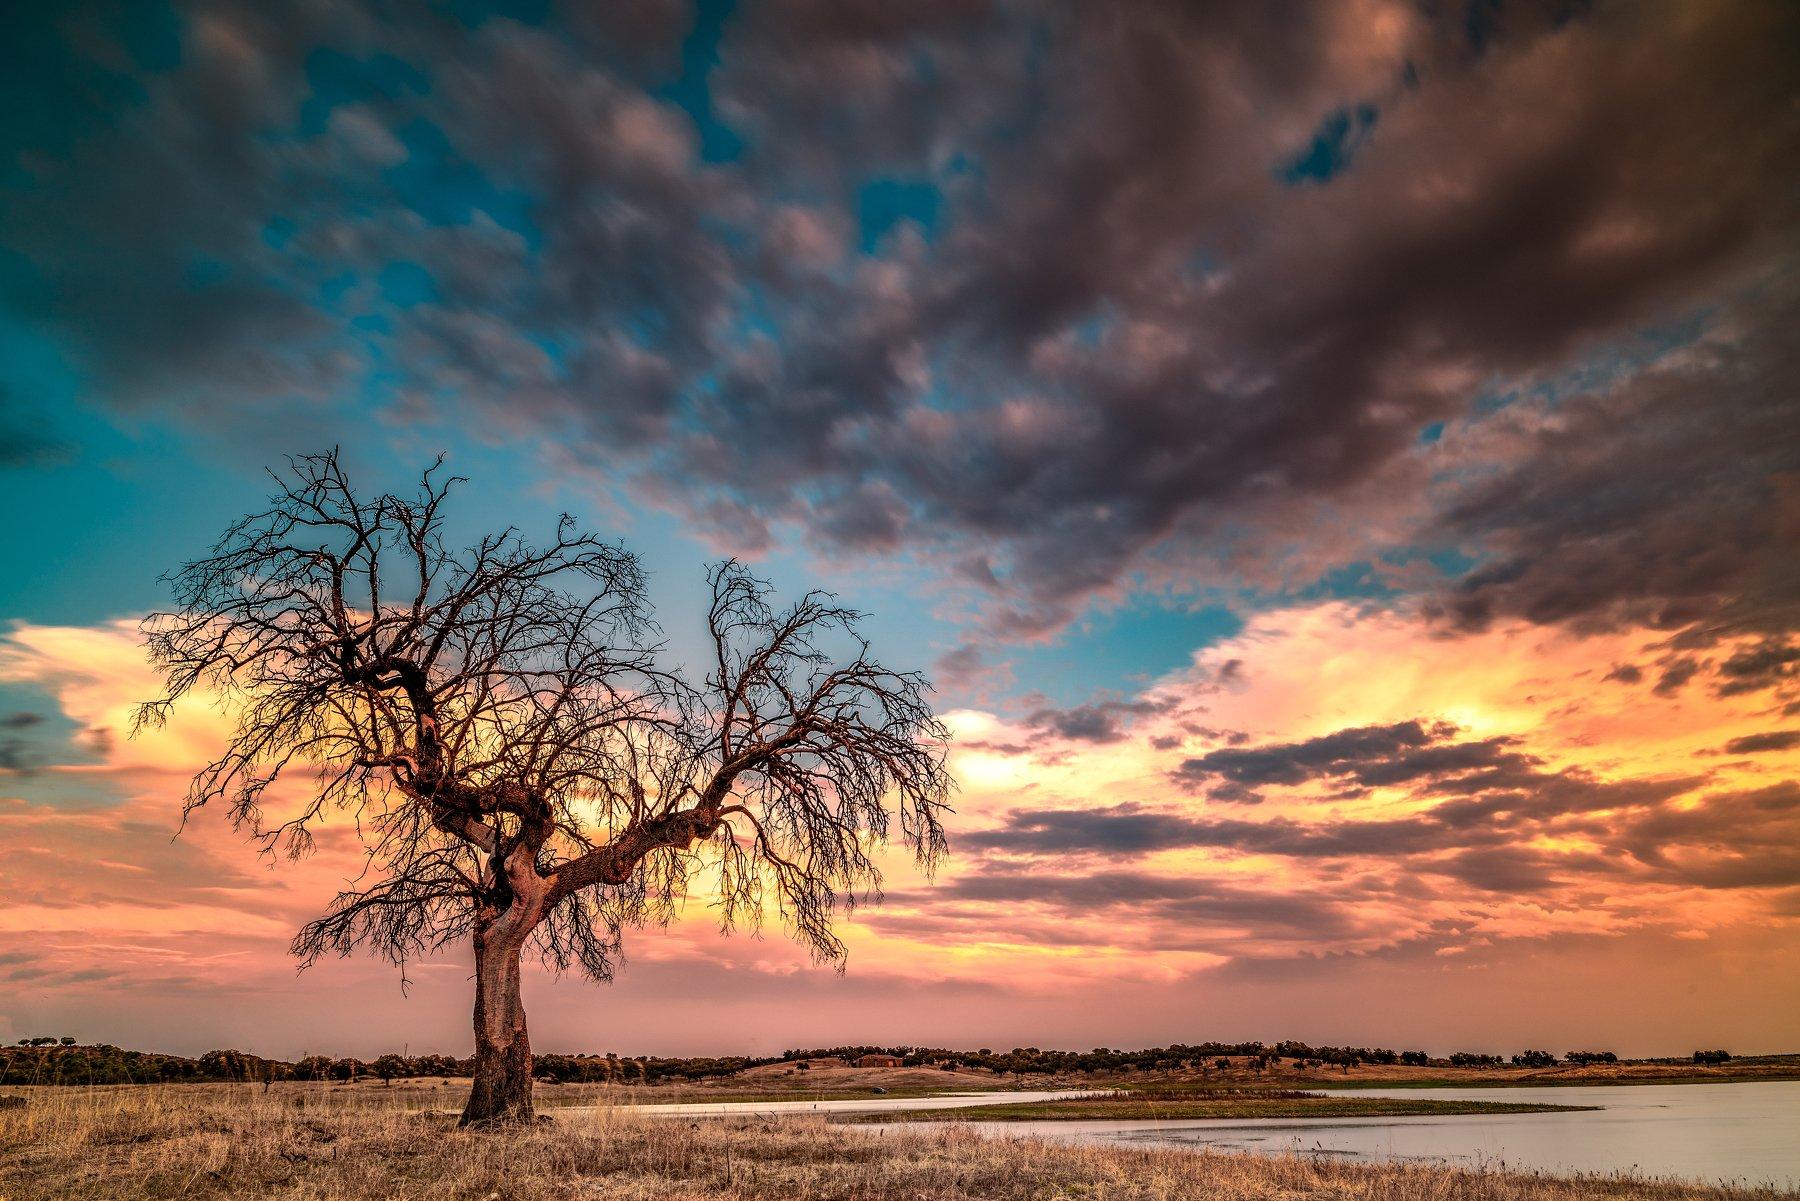 tree,sunset,lake,portugal,travel,lighthunter,lanscape,zeiss,nikond810,felix ostapenko,amazing view, Felix Ostapenko